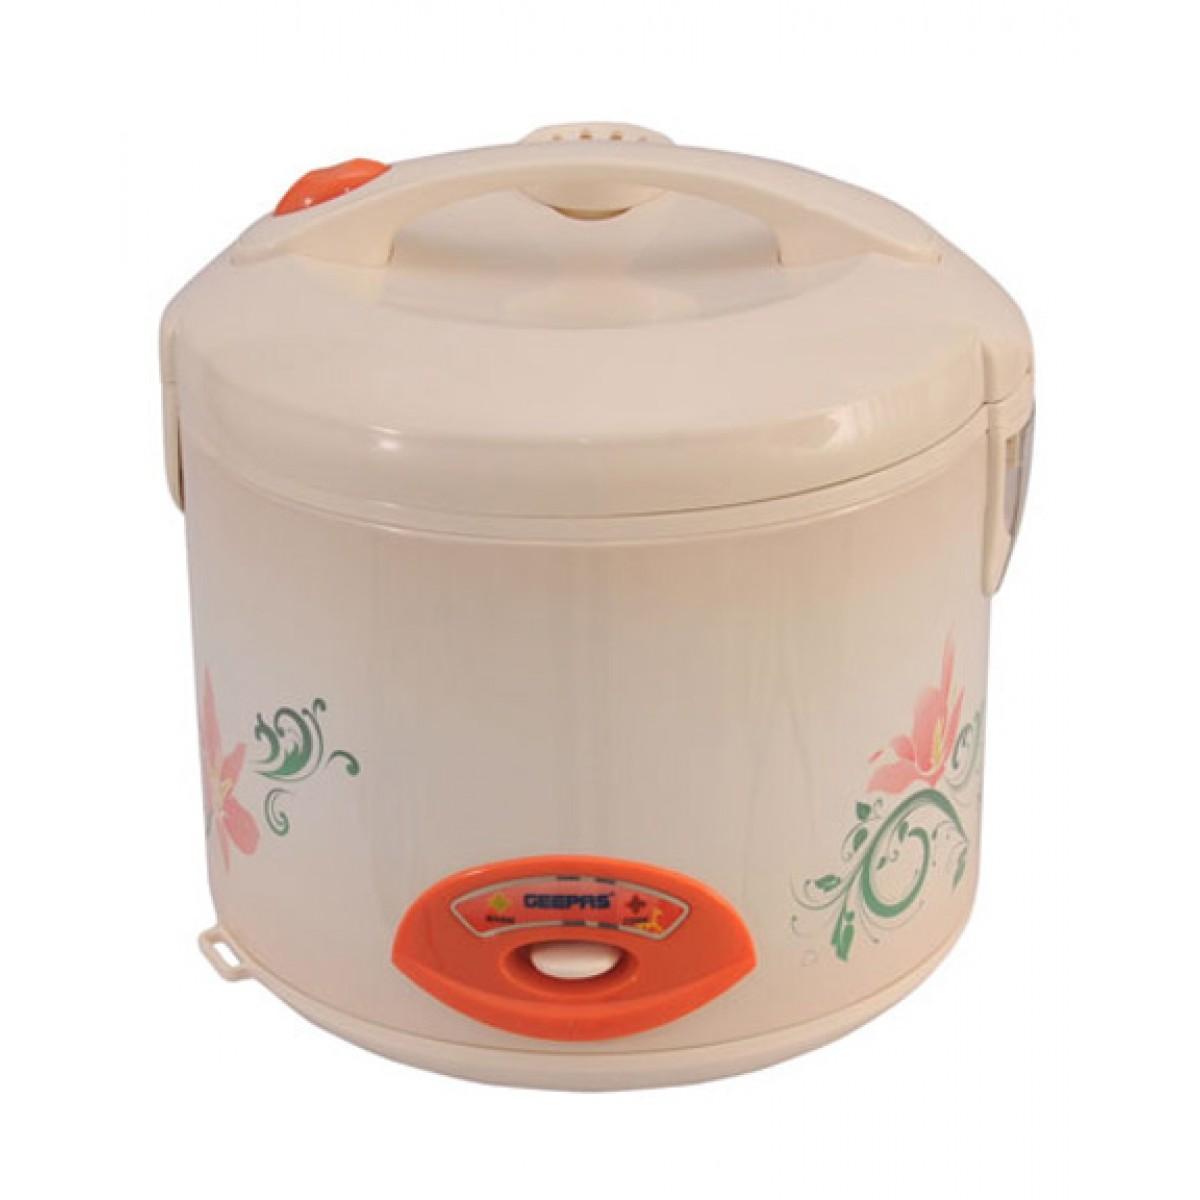 24a321b2d40 Geepas Rice Cooker (GRC1825) Price in Pakistan